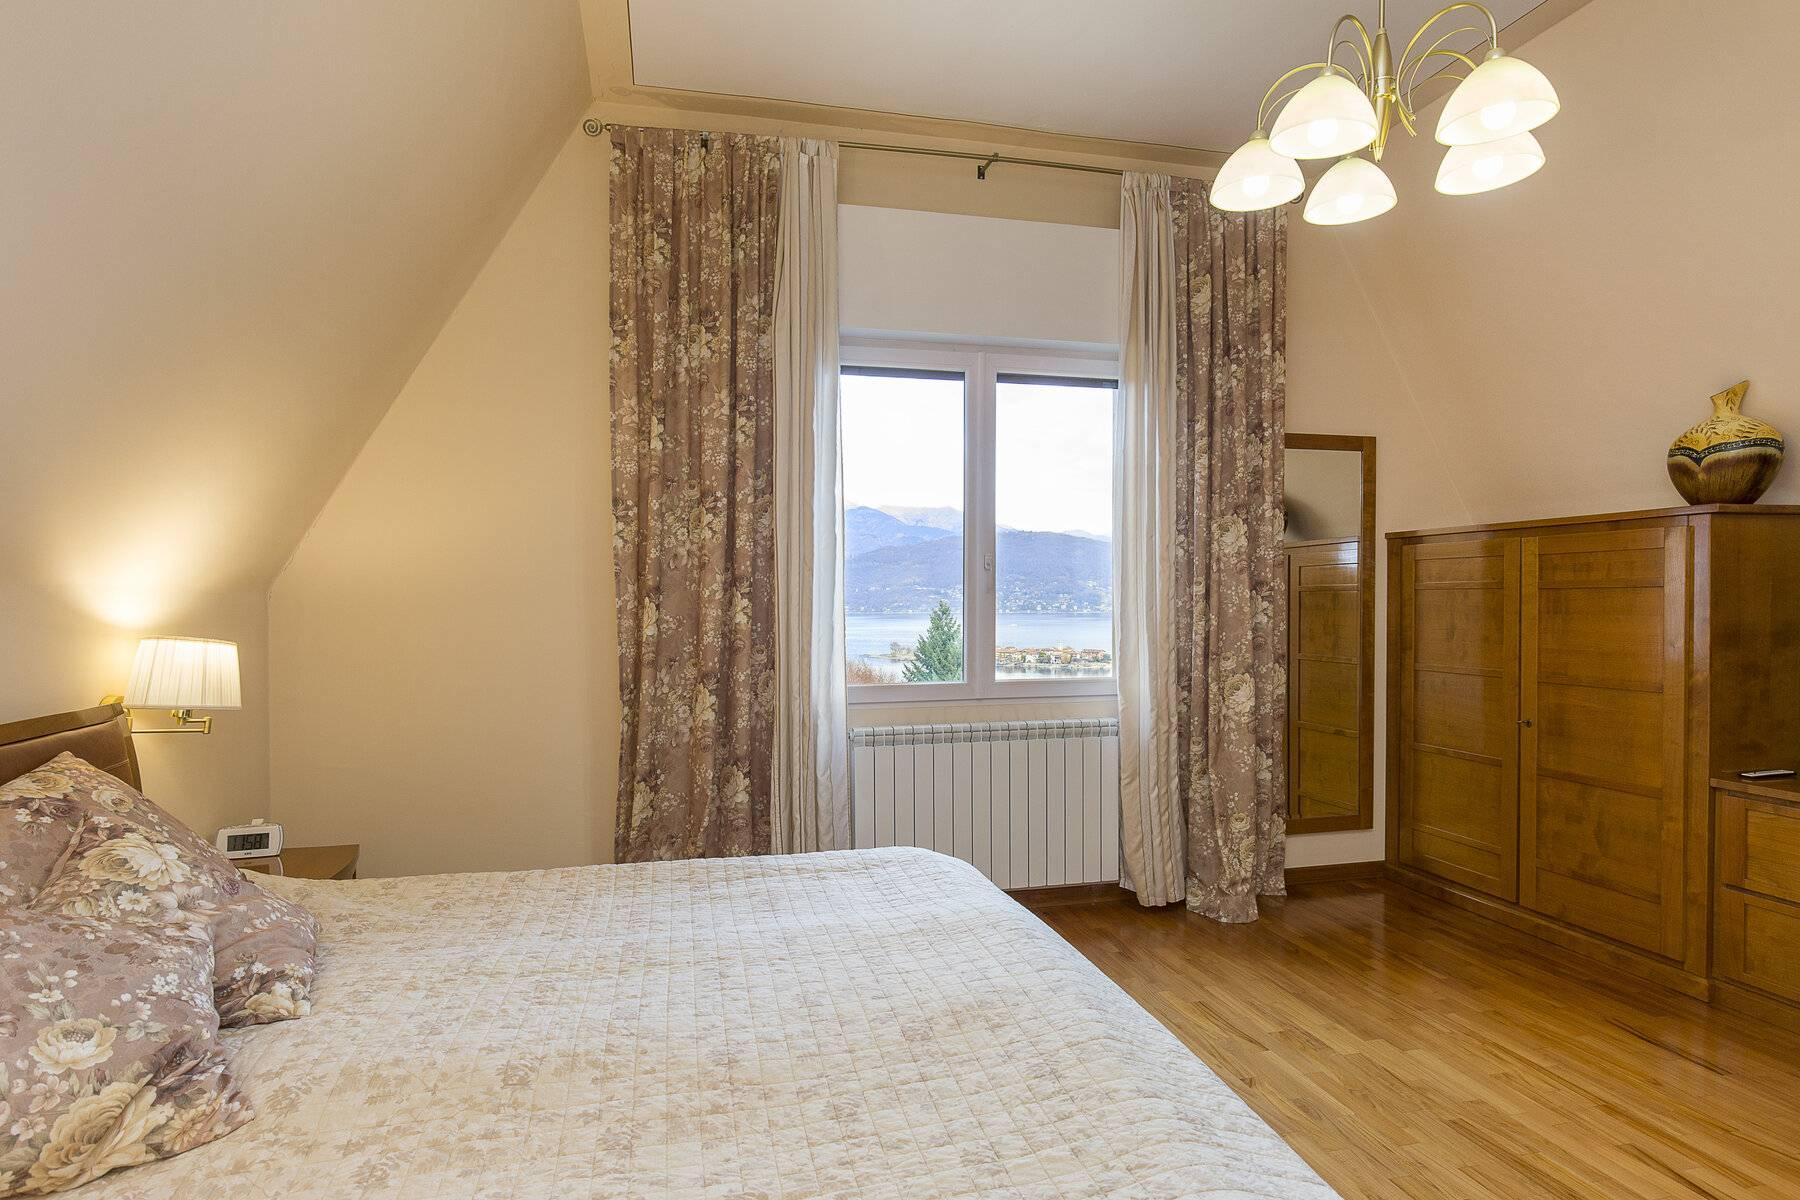 Villa in Vendita a Stresa: 5 locali, 364 mq - Foto 21